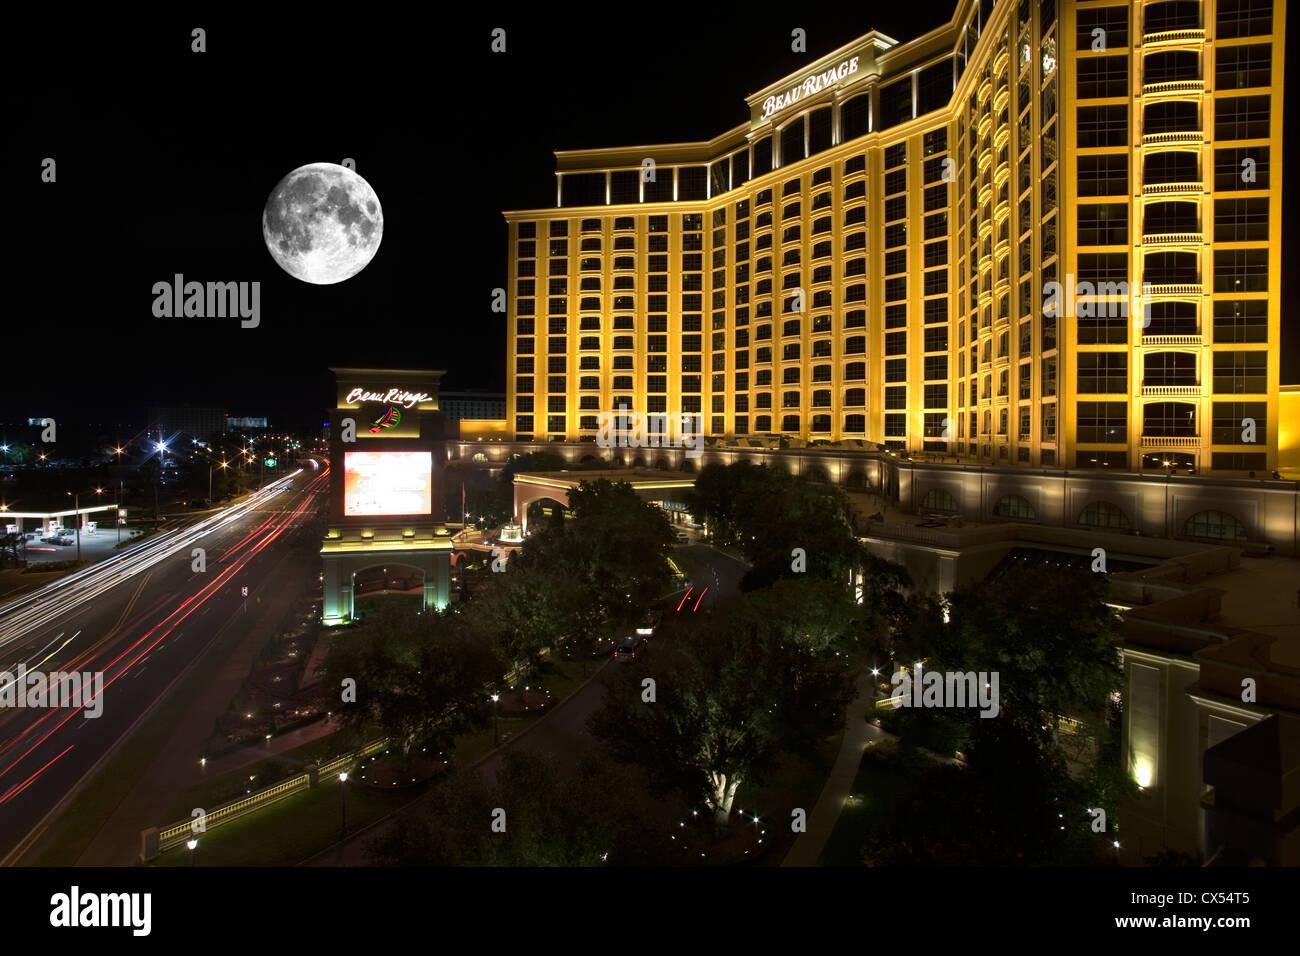 Beau Rivage Resort Casino Beach Boulevard Biloxi Mississippi Usa